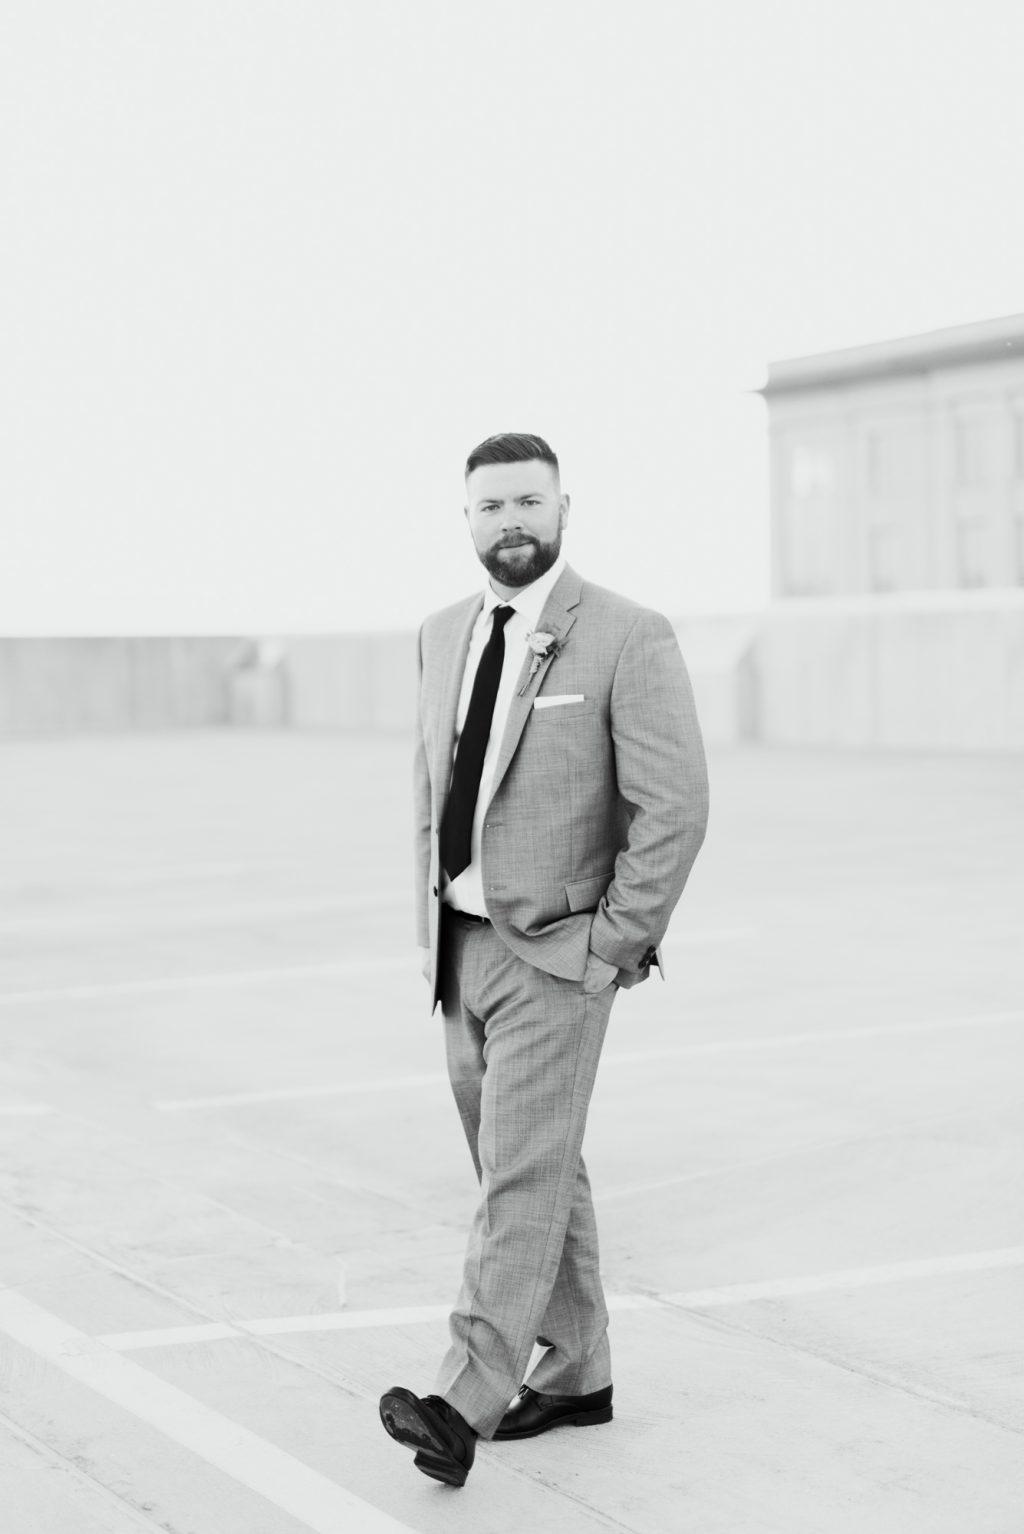 haley-richter-photo-west-chester-summer-wedding-boxcar-brewery-189